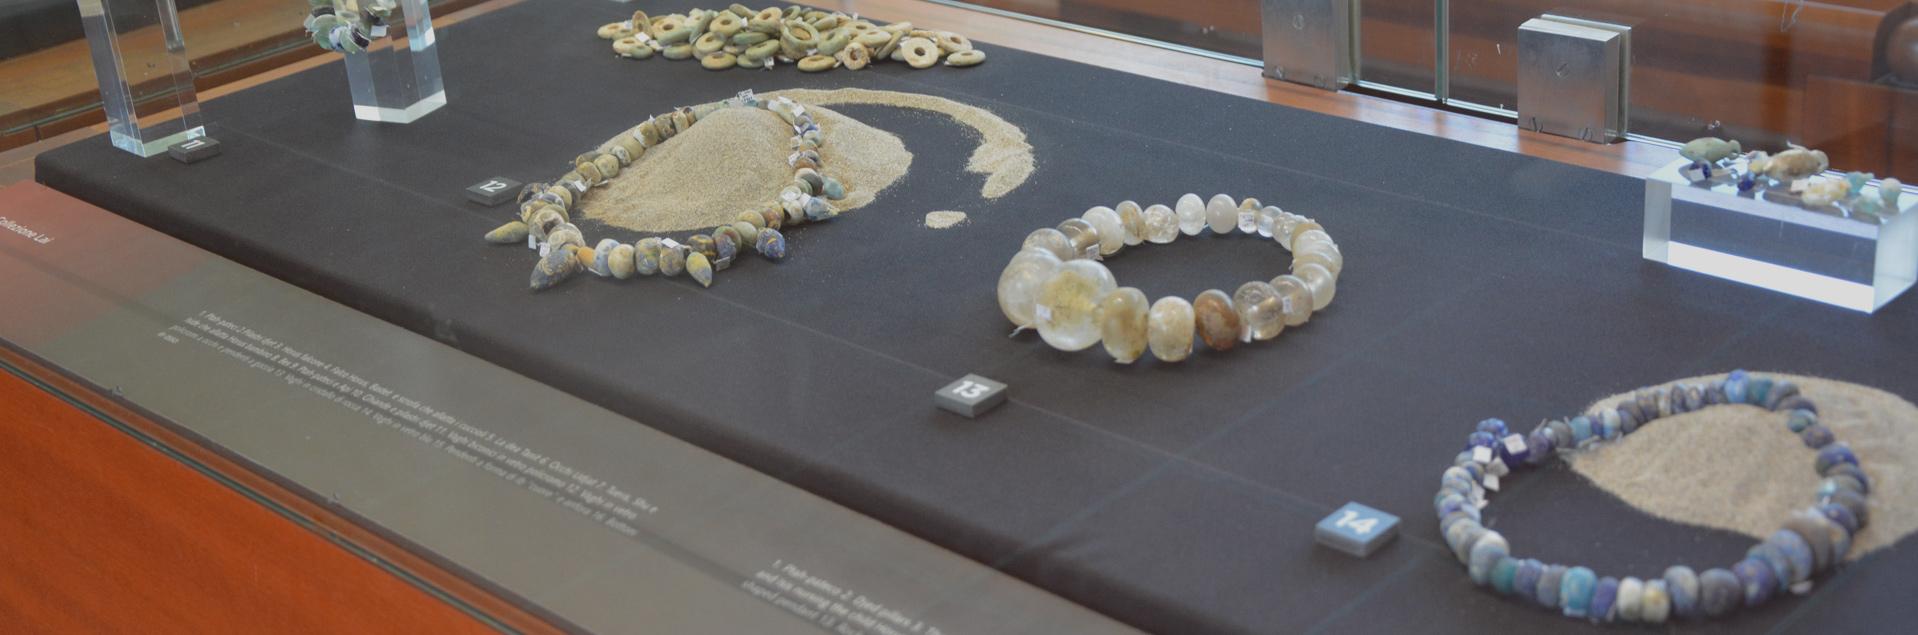 Museo Archeologico Ferruccio Barreca, Sala 3